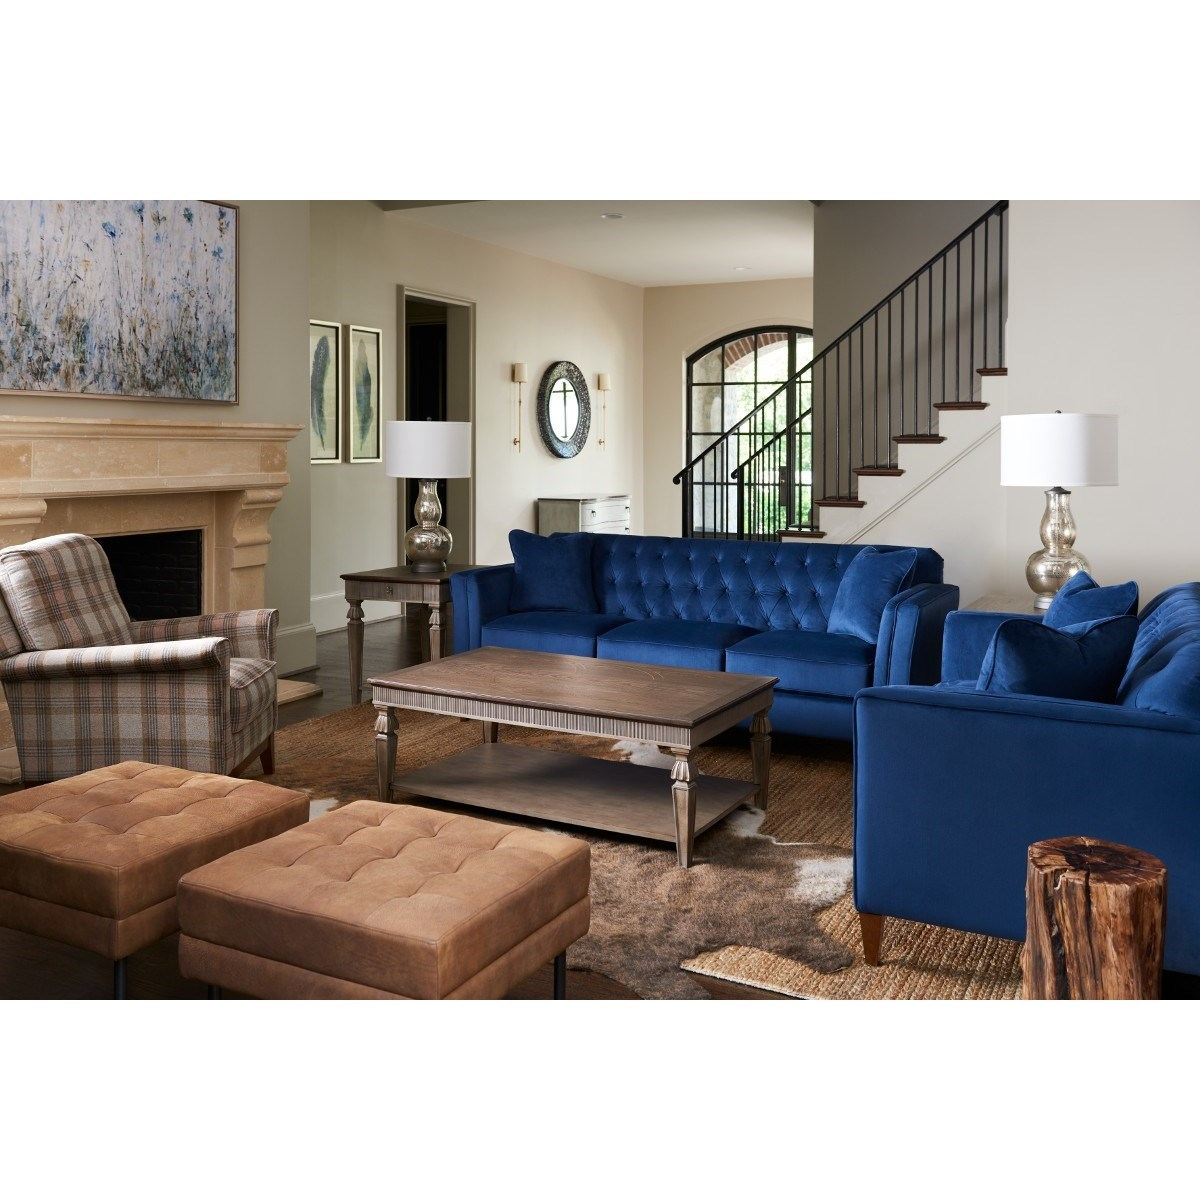 Alexandria Stationary Living Room Group by La-Z-Boy at Sparks HomeStore